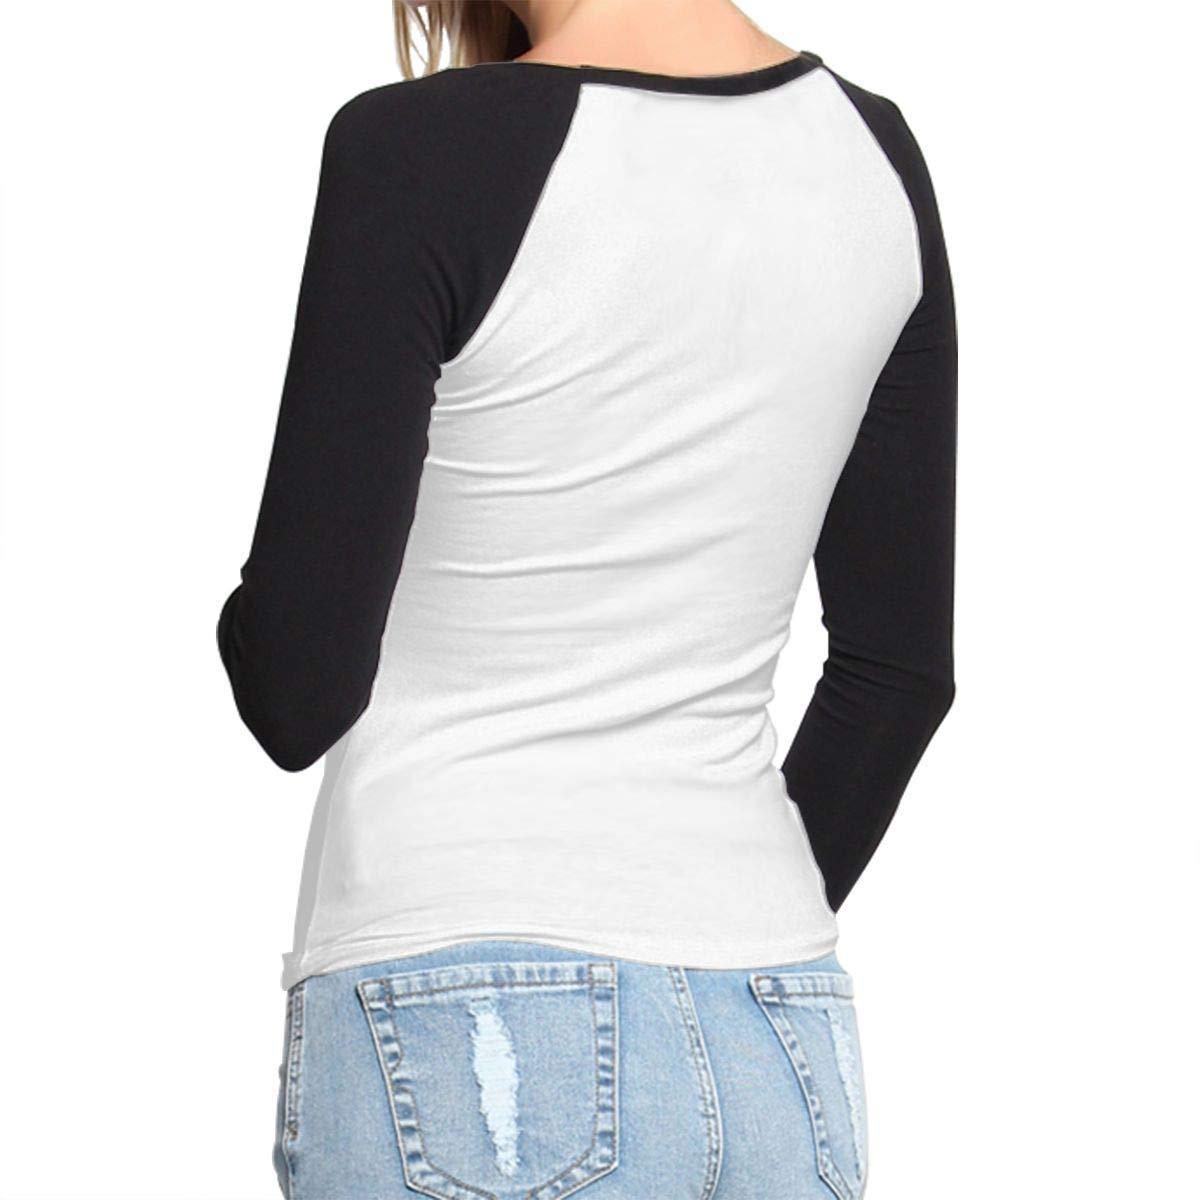 Merry Christmas Womens Raglan Tee Shirts Long Sleeve Womens Baseball Tops Black